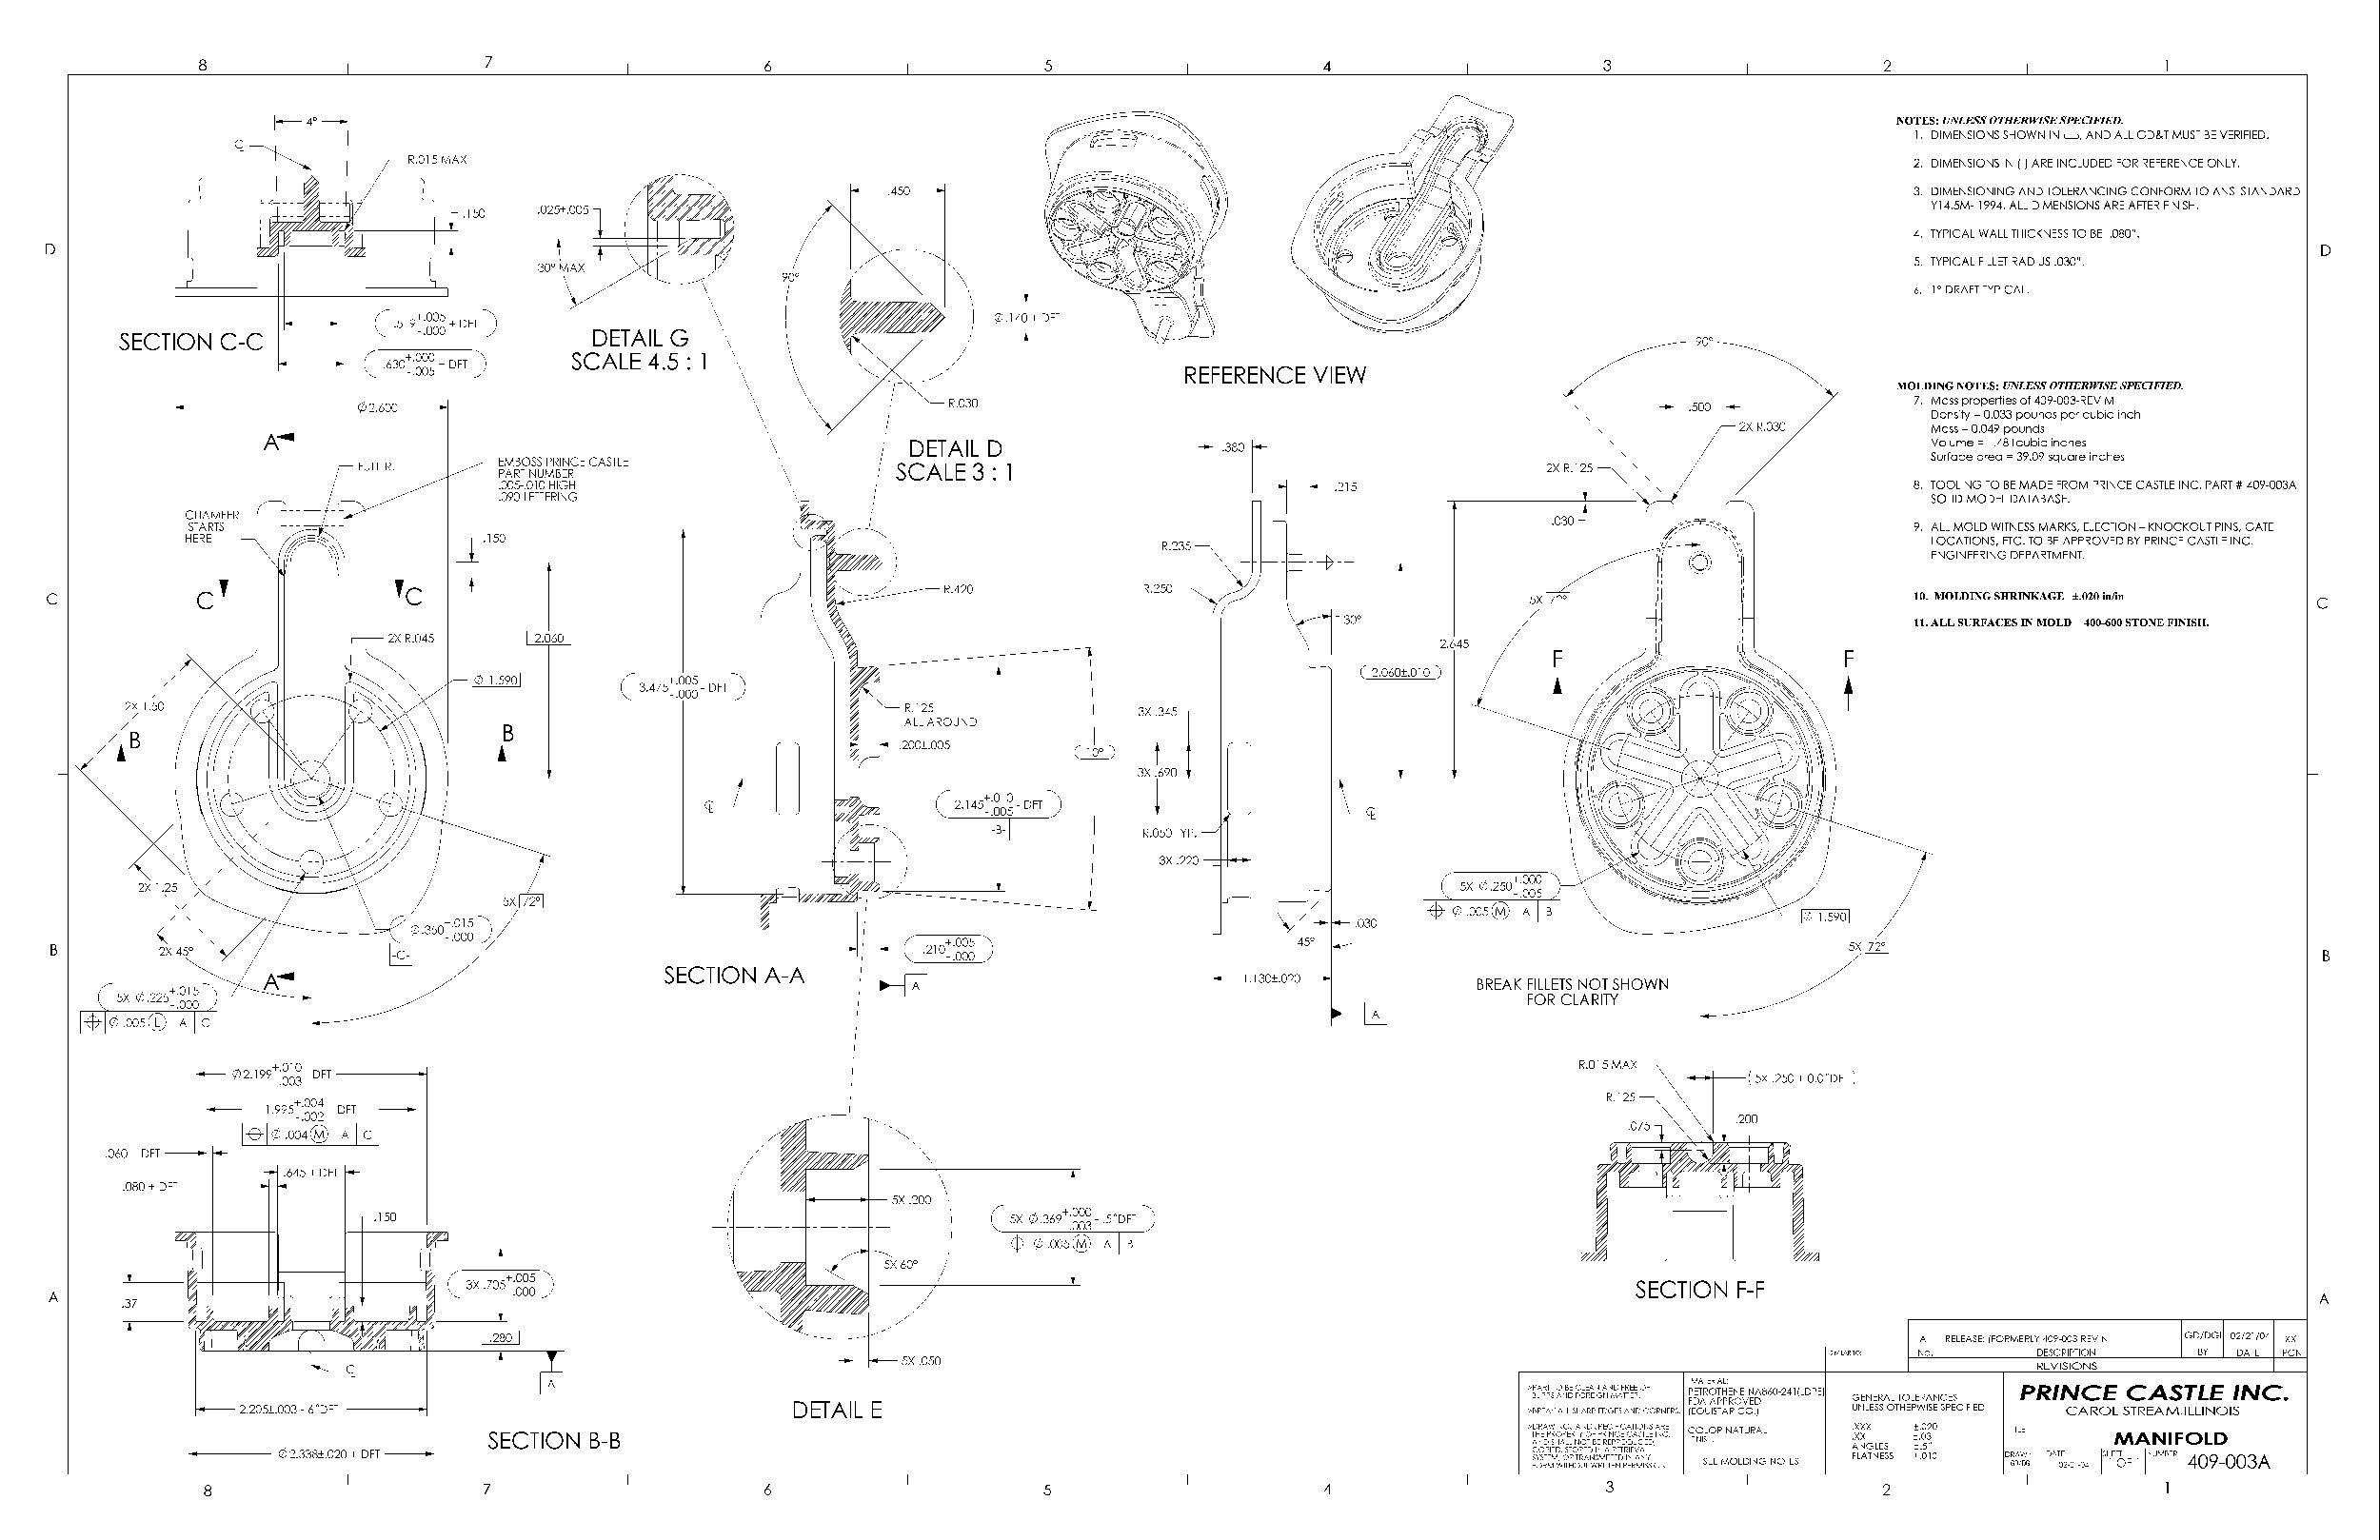 inj-mold-drawing-prince castle-condiment dispenser manifold